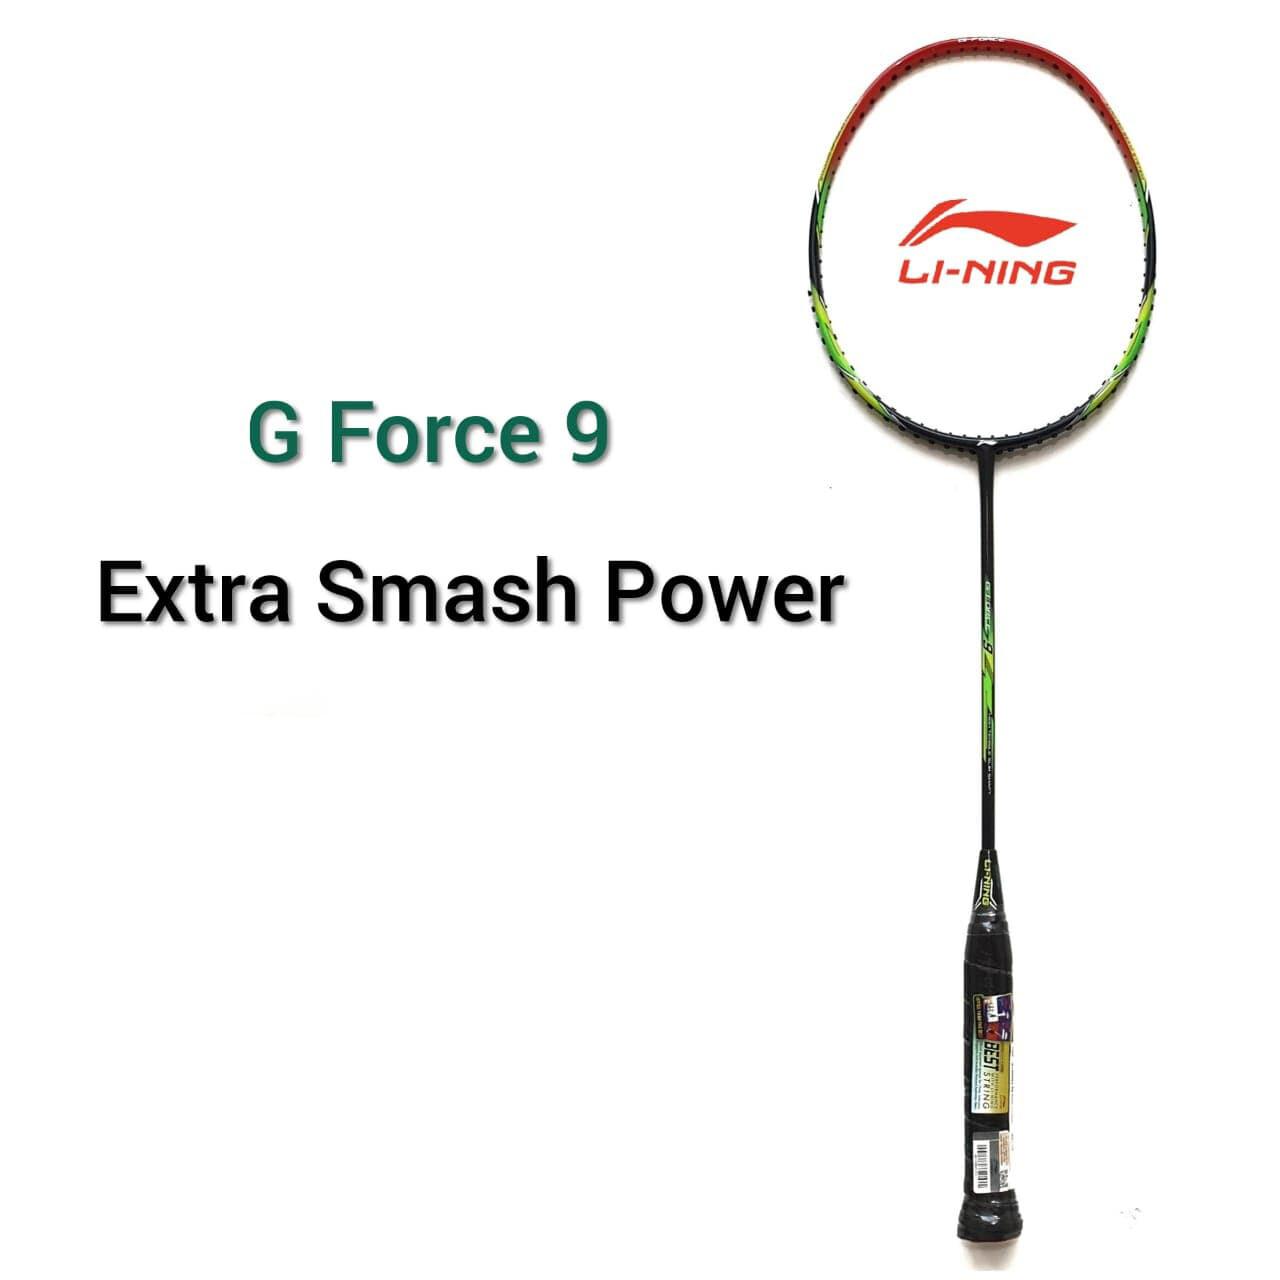 LI-NING G-Force 9 Badminton Racquet-